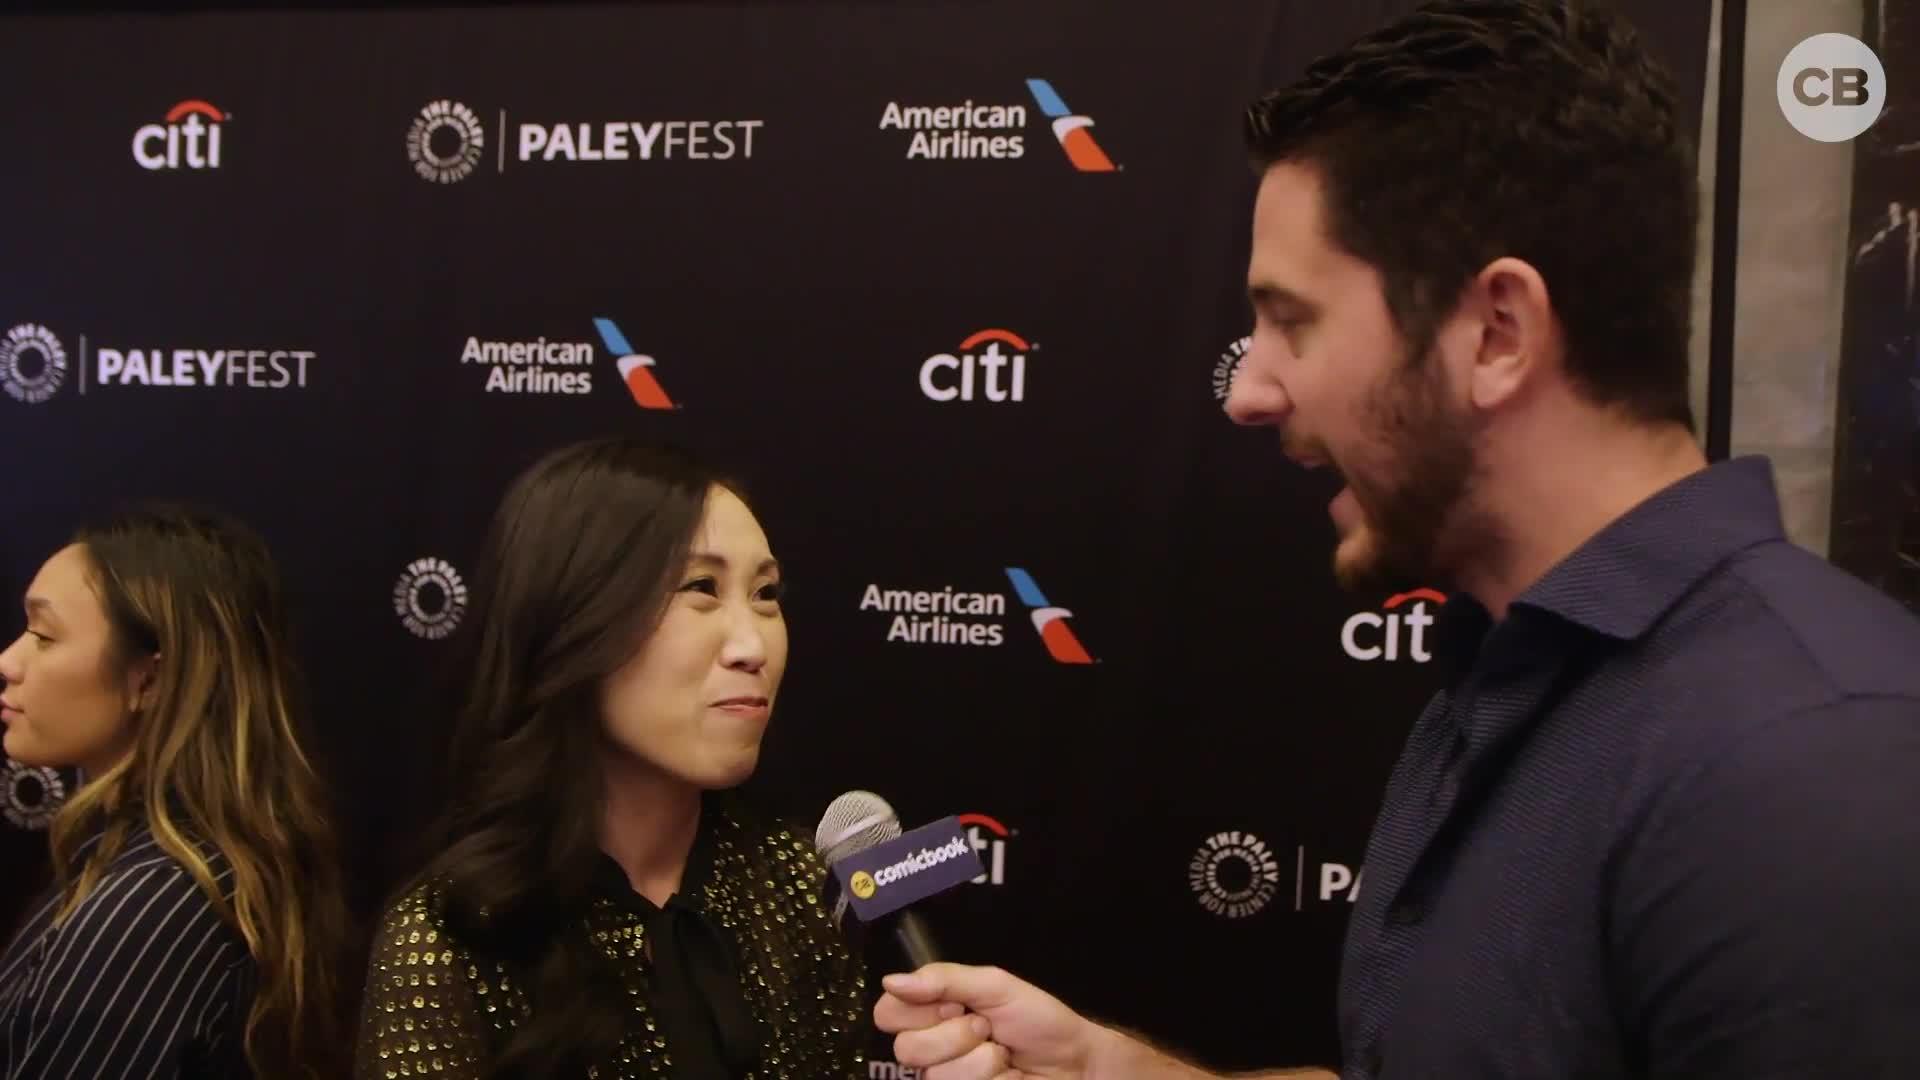 Angela Kang Talks 'The Walking Dead' at Paleyfest screen capture